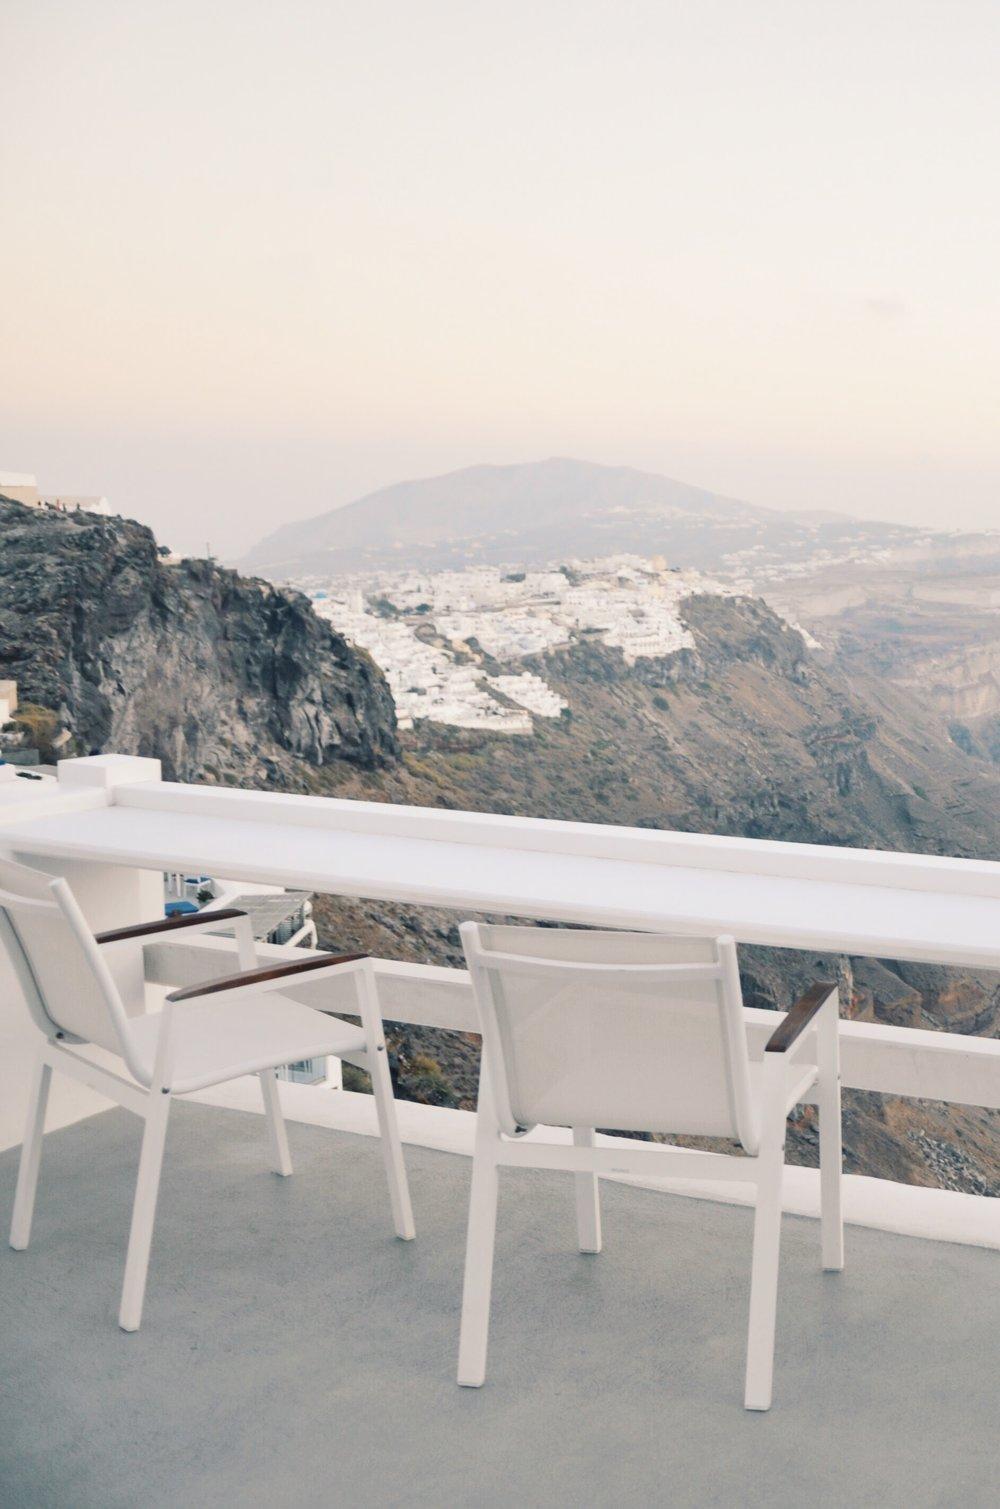 View from the balcony at the Aqua Luxury Suites in Imerovigli, Santorini, Greece